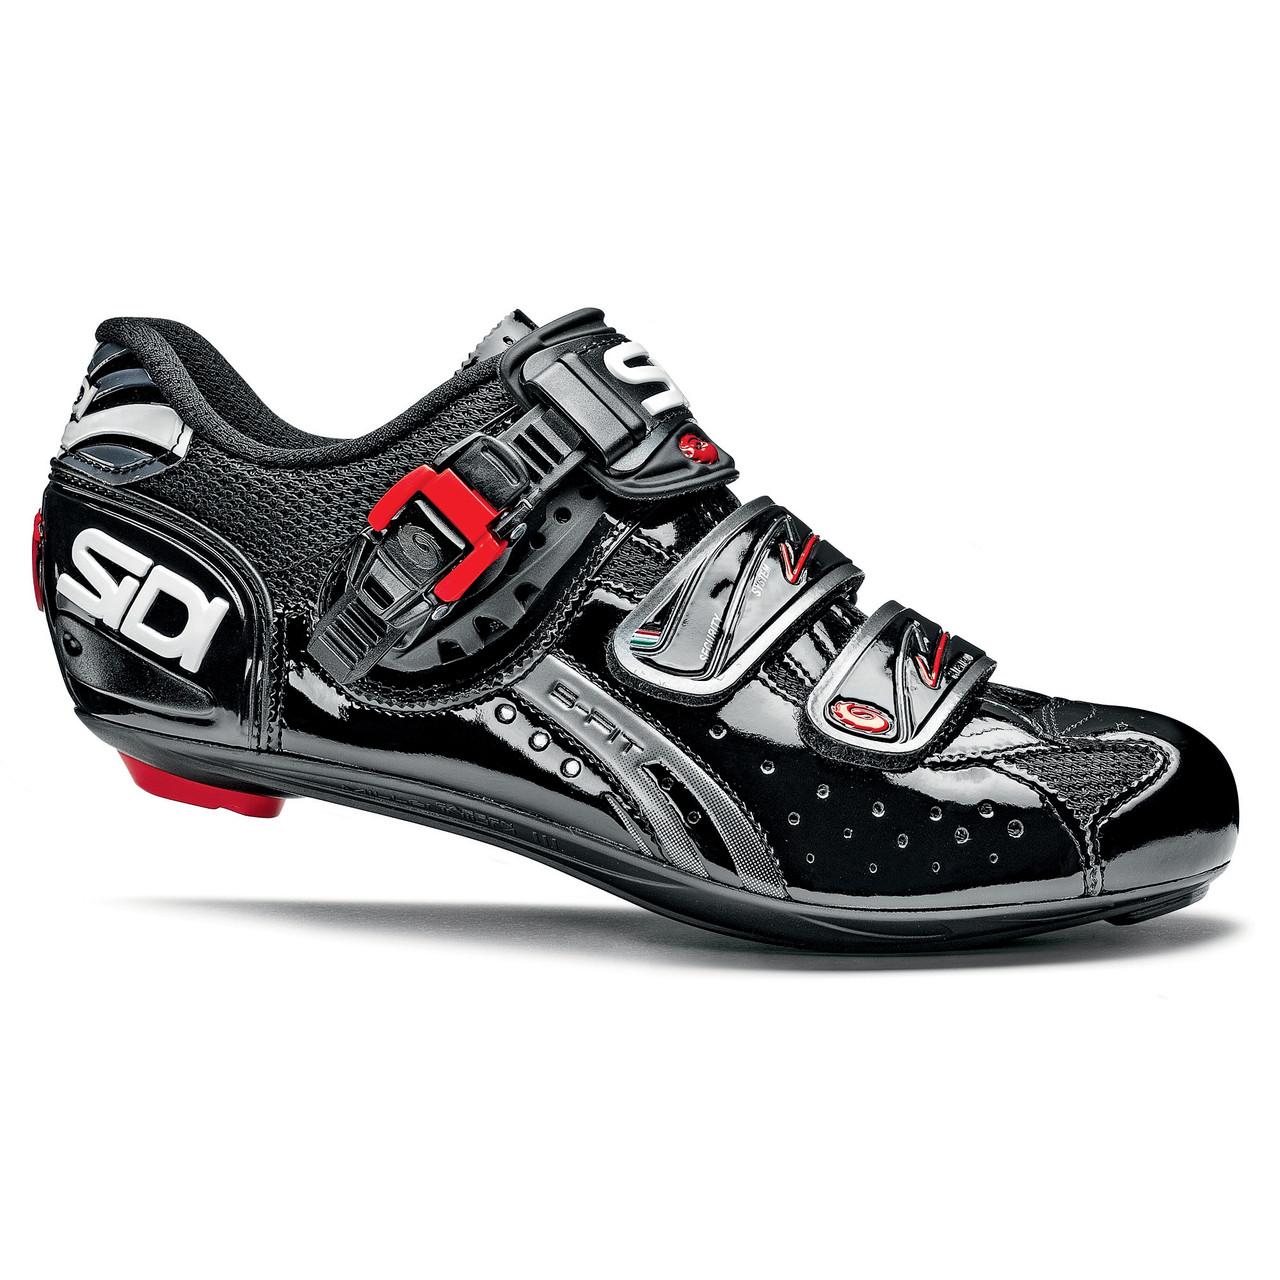 d6a163754b0 Women s SIDI® Genius Fit Road Shoes